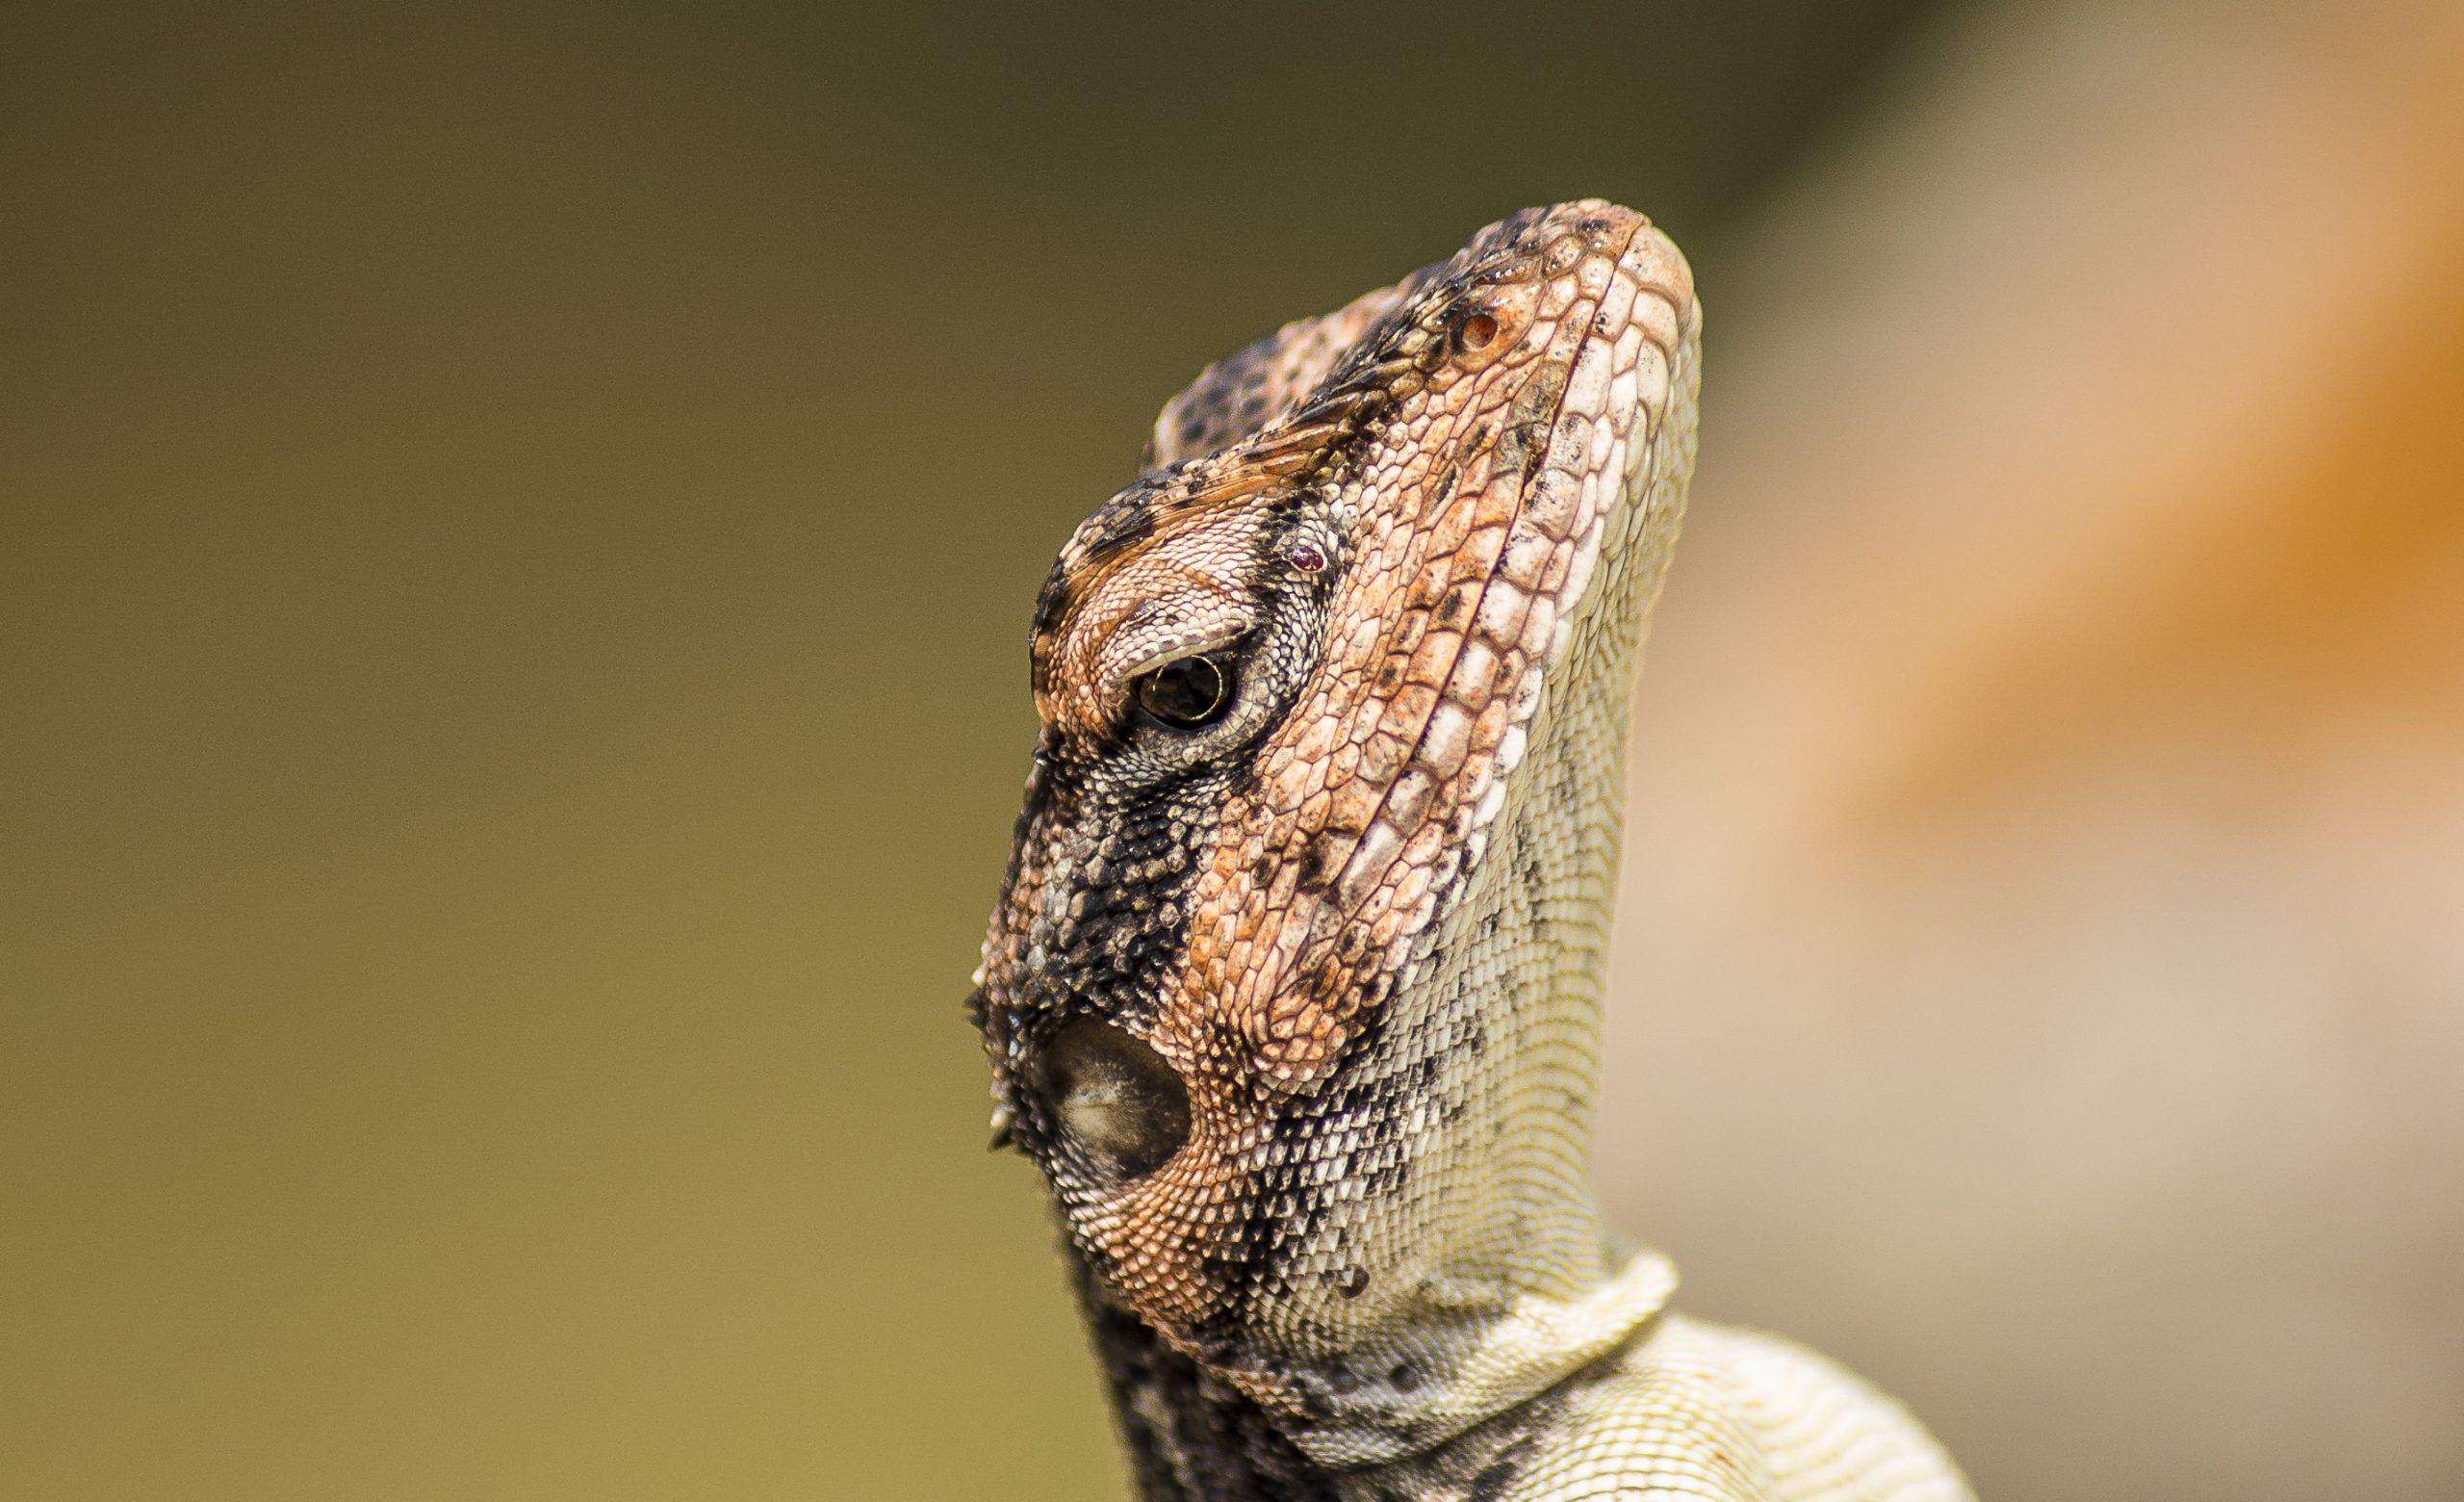 Neck of Garden lizard